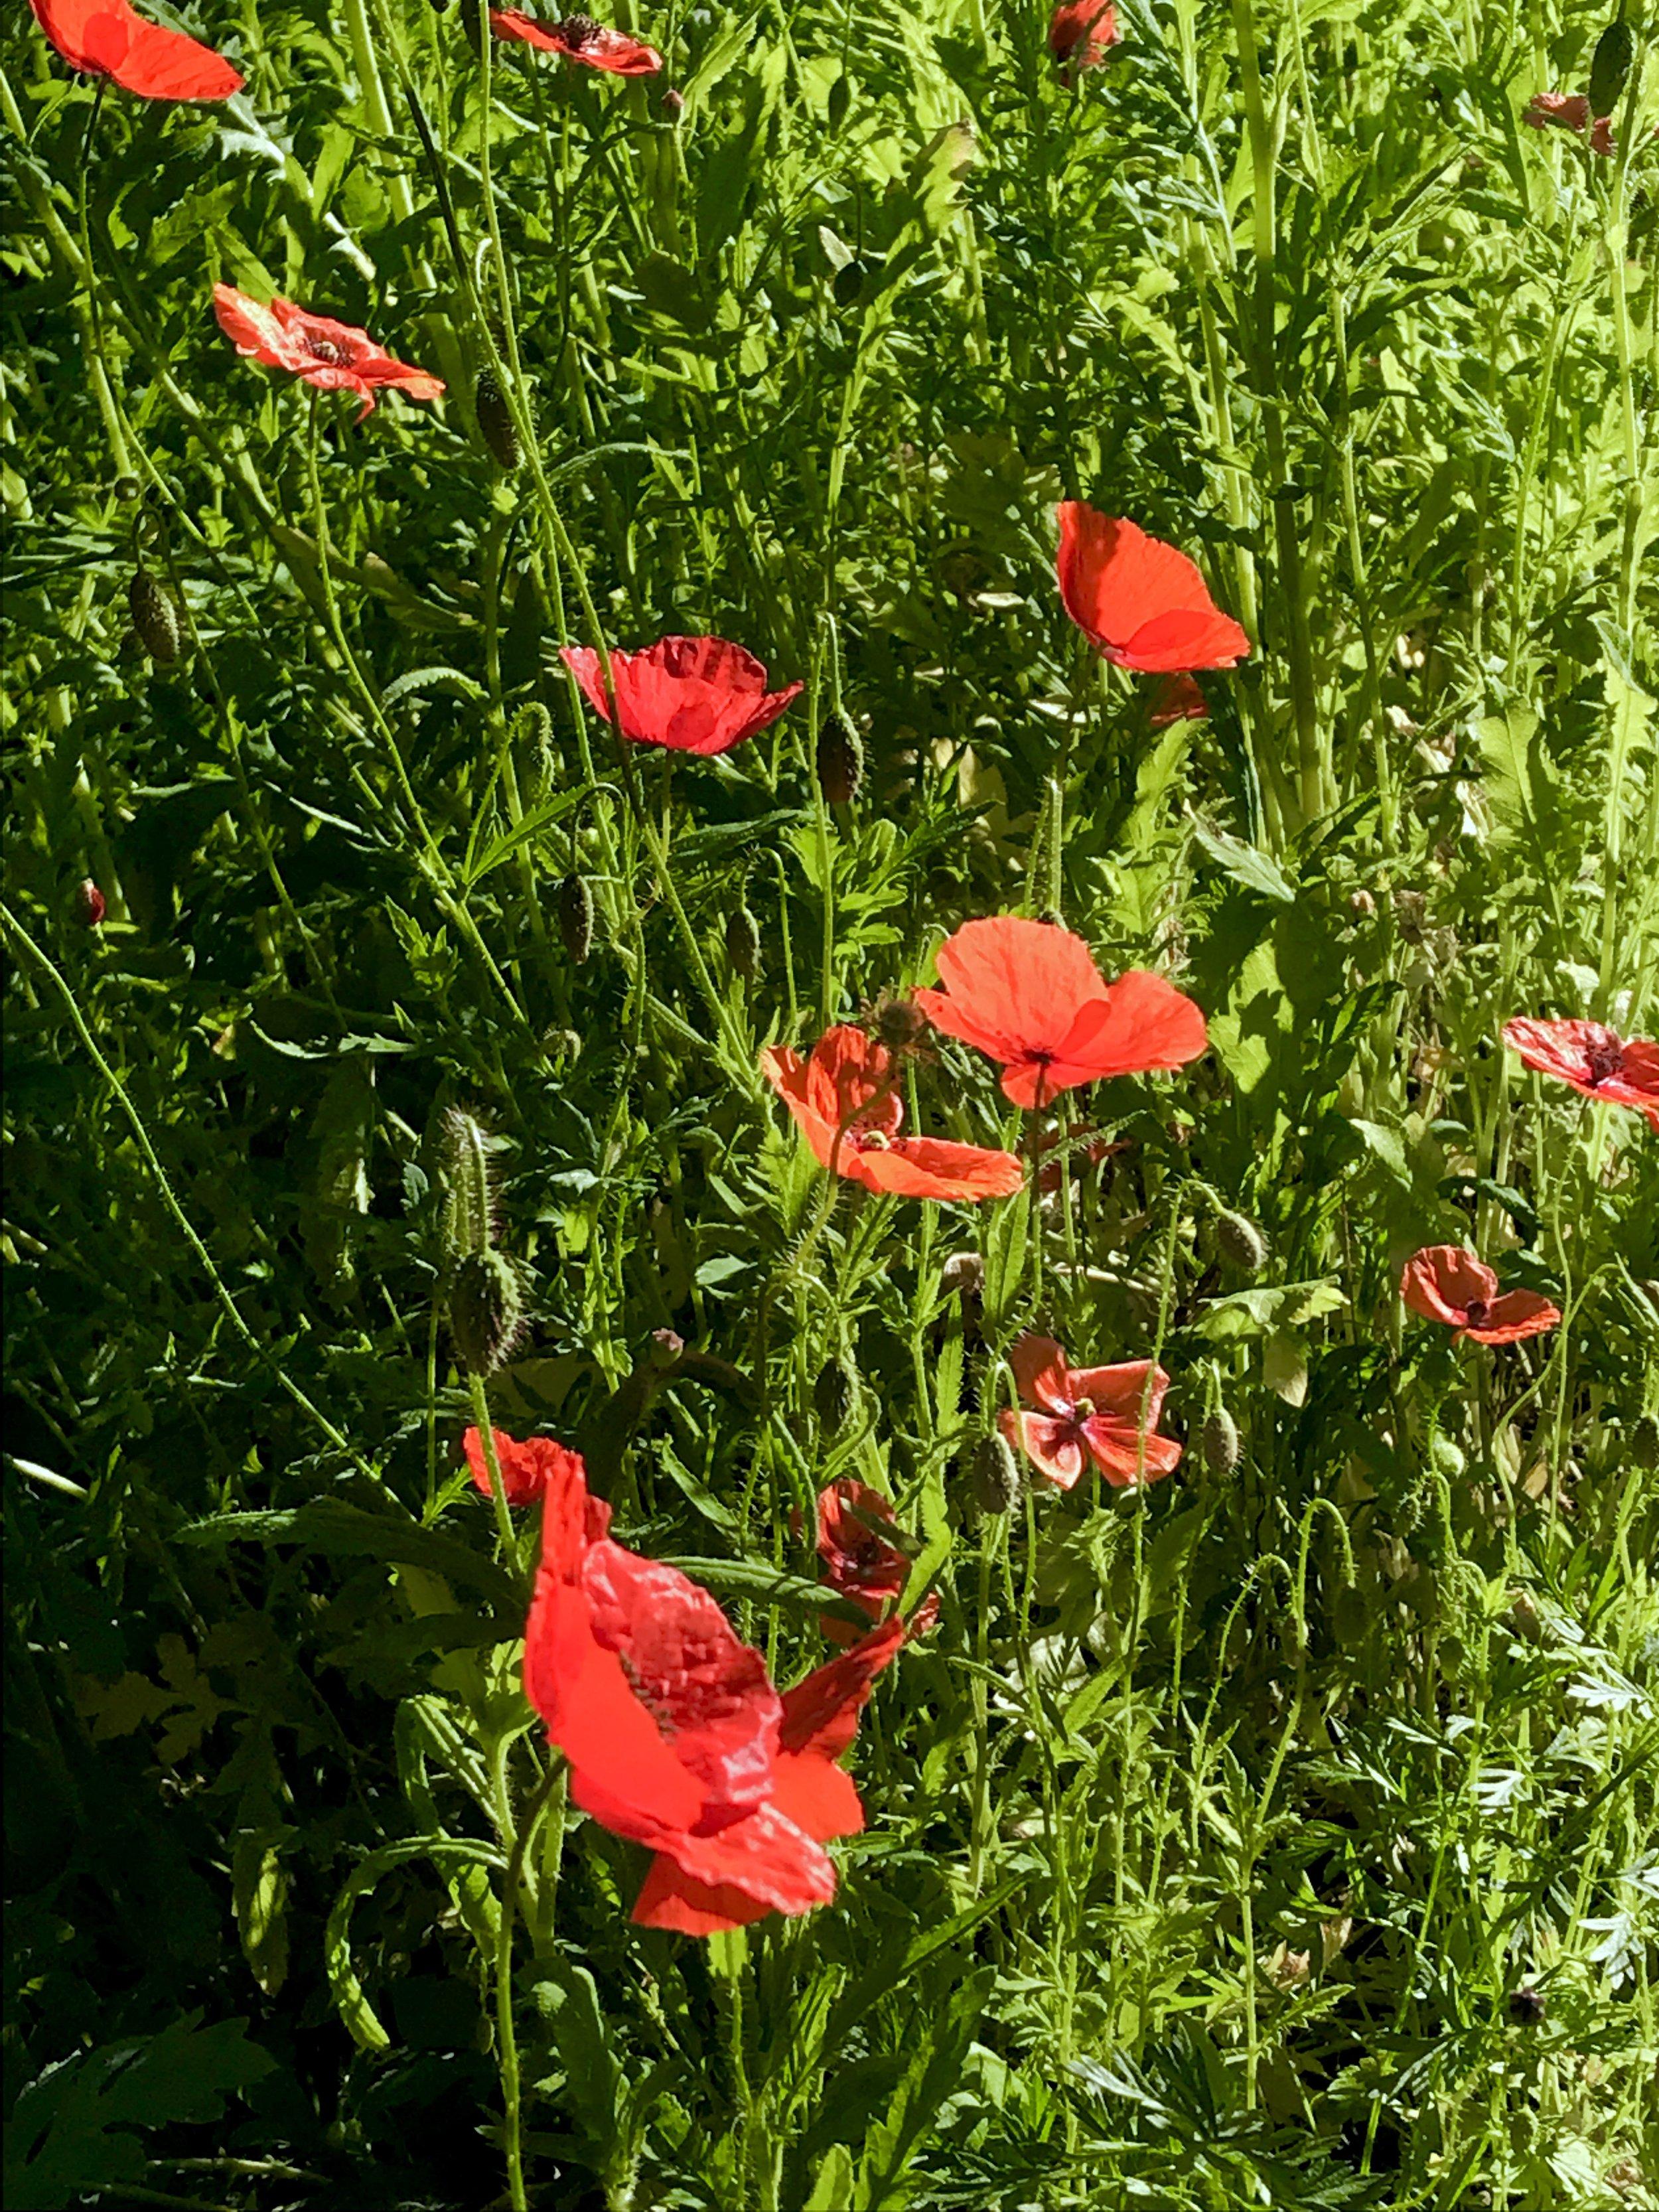 Vineyard Gardens WWI Memorial poppy garden along State Road